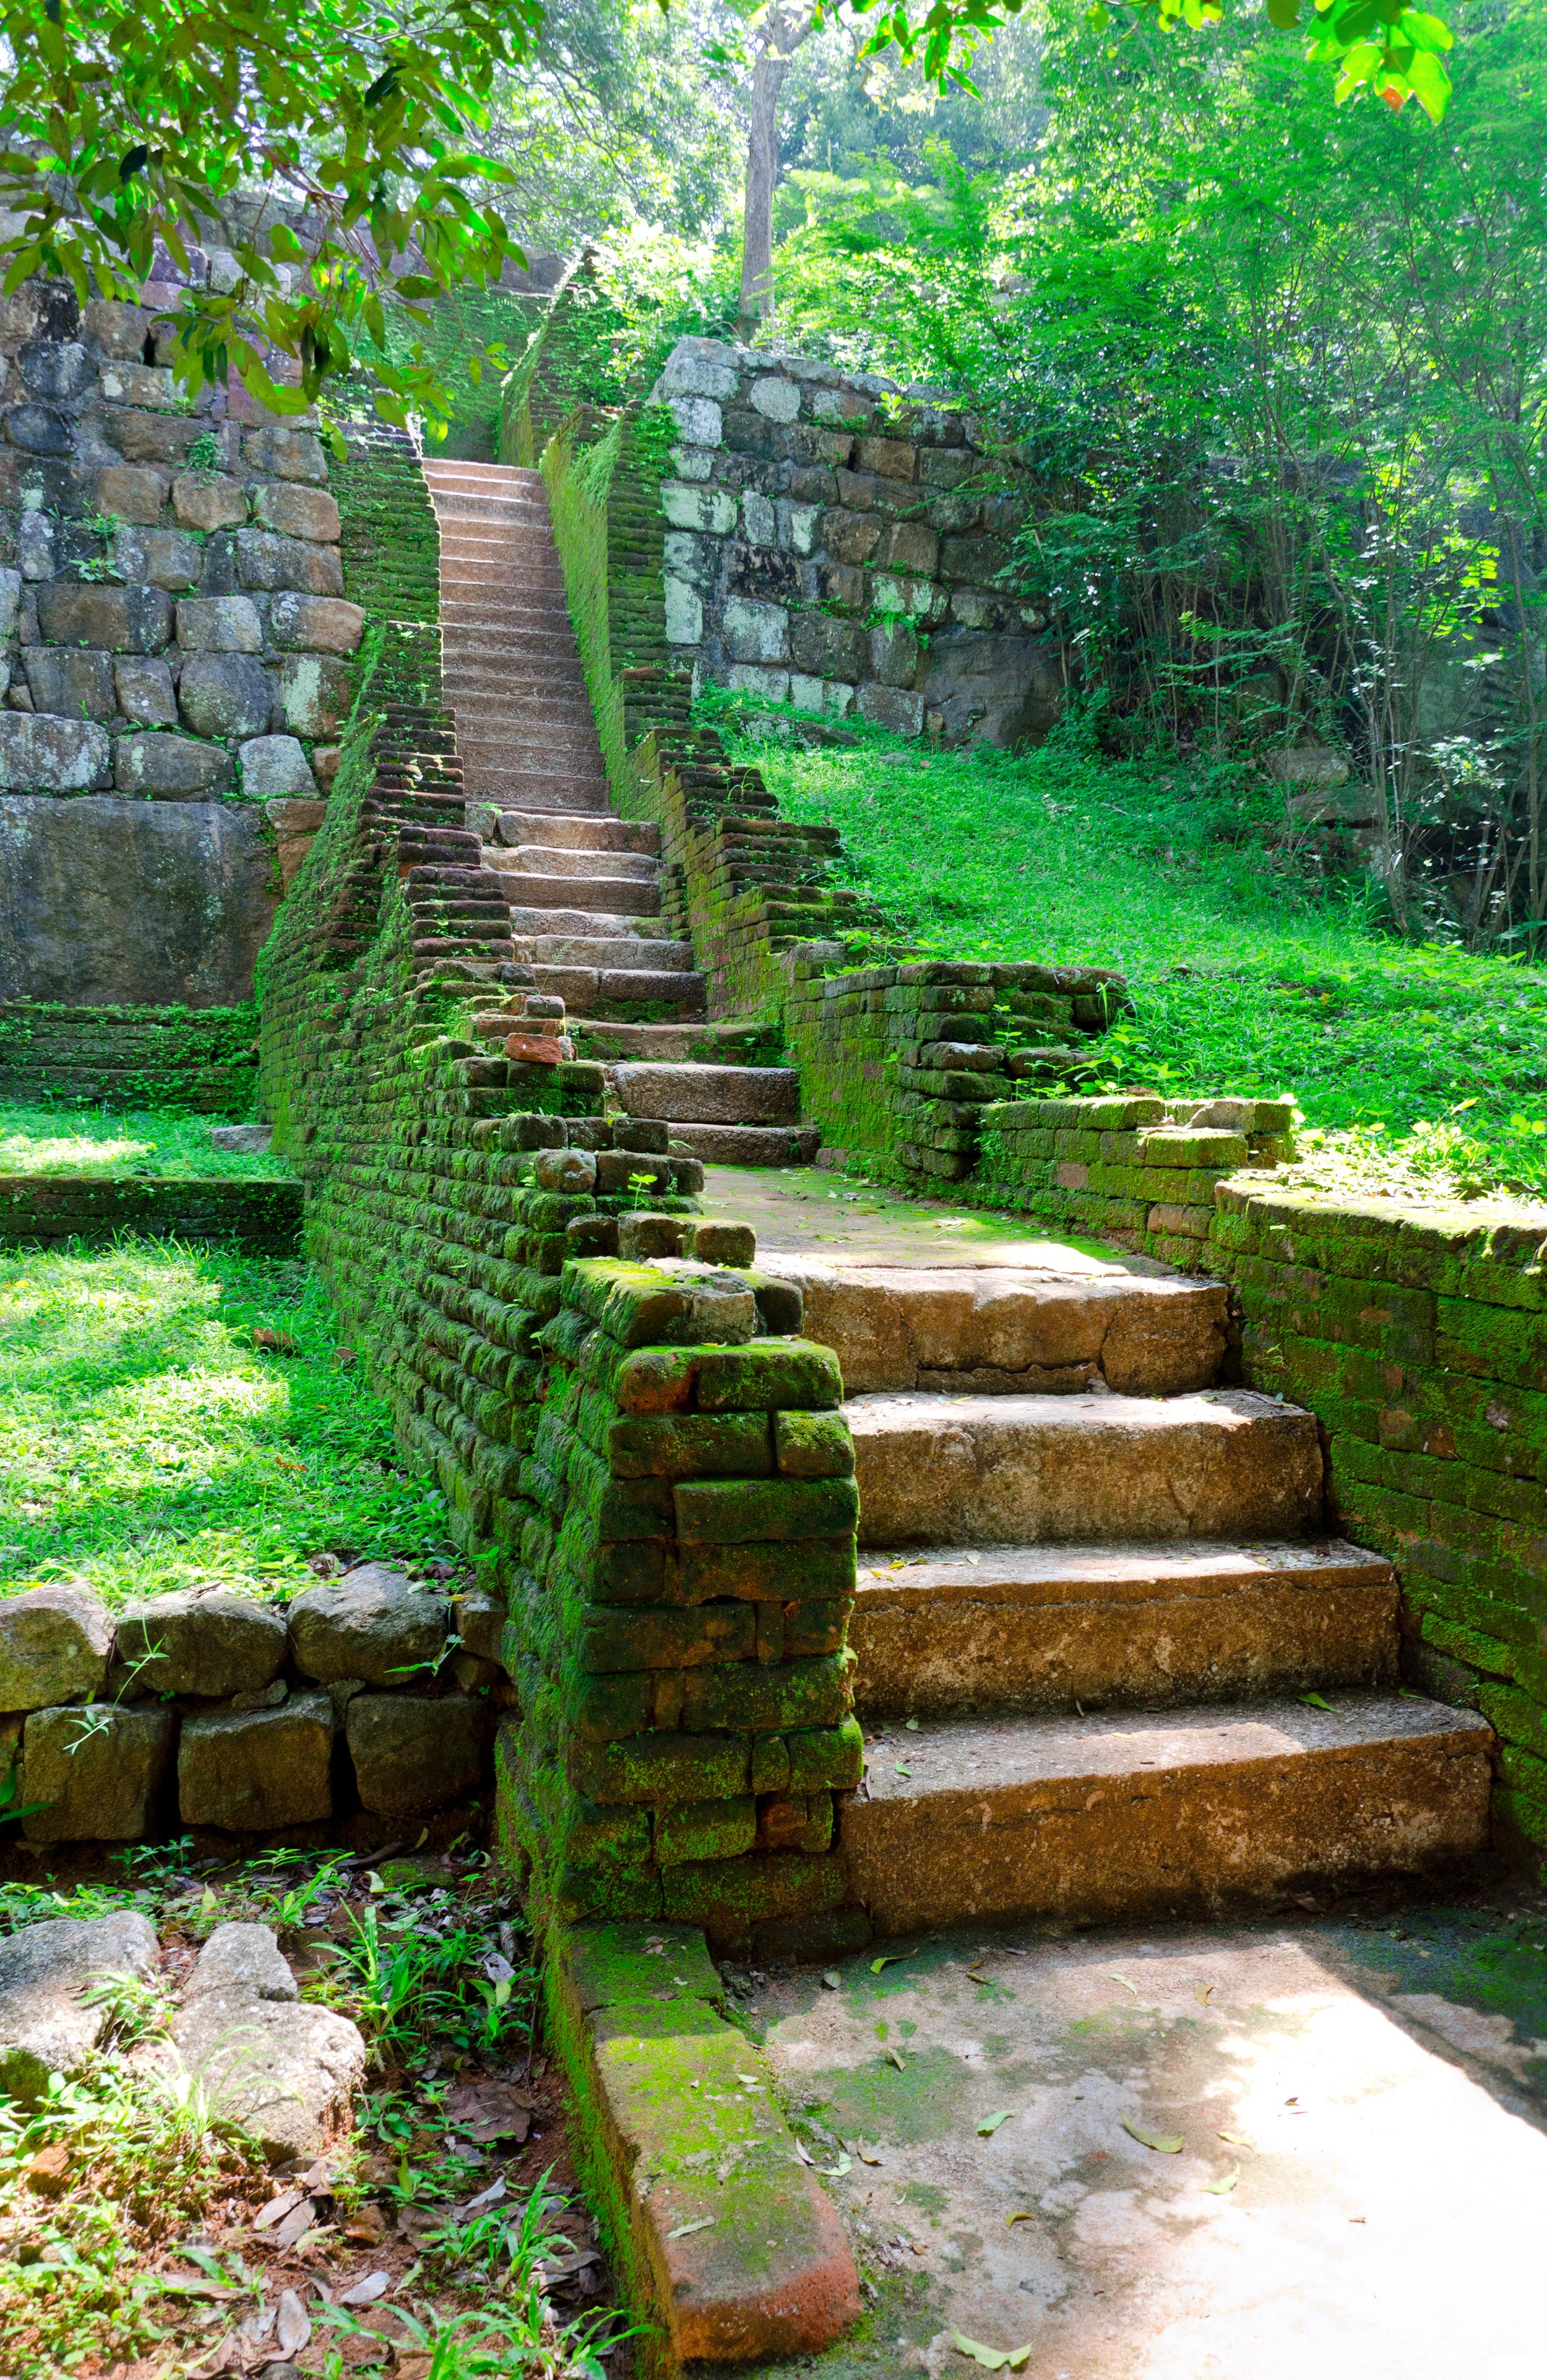 invite-to-paradise-sri-lanka-holiday-honeymoon-sigiriya-rock-fortress-stairs.jpg